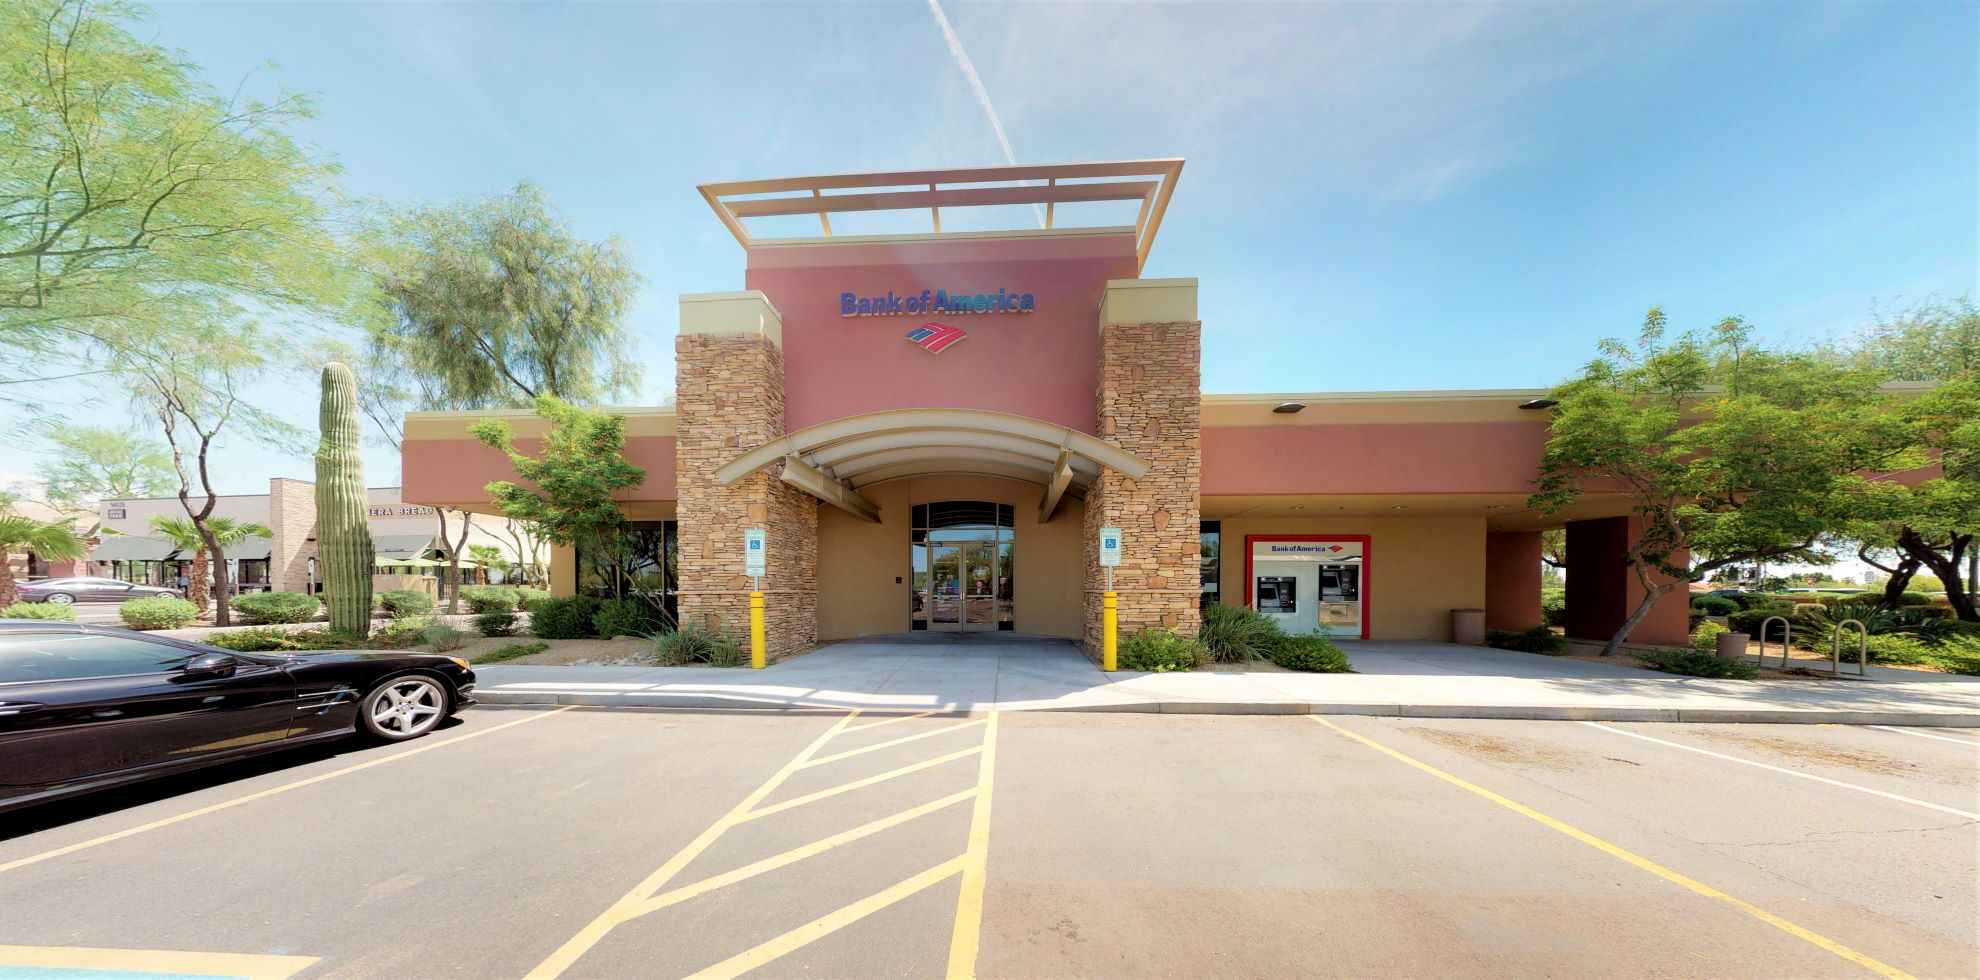 Bank of America financial center with drive-thru ATM   8750 E Raintree Dr, Scottsdale, AZ 85260